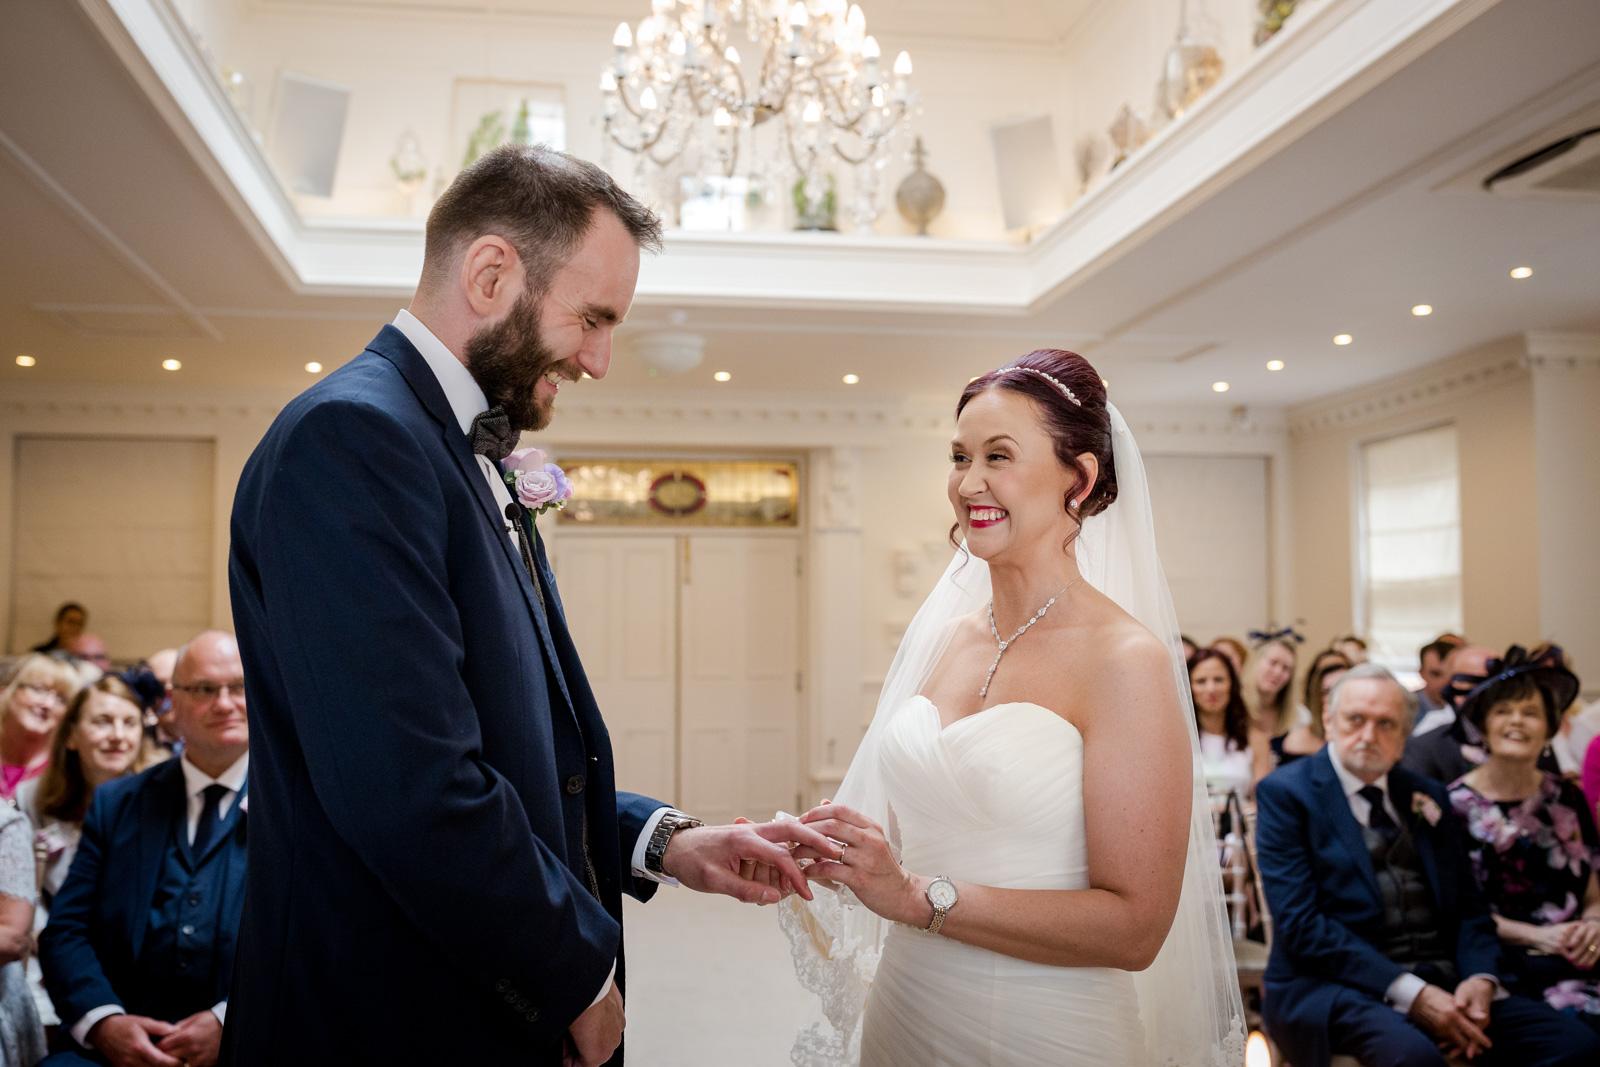 Ashfield House Wedding in Standish